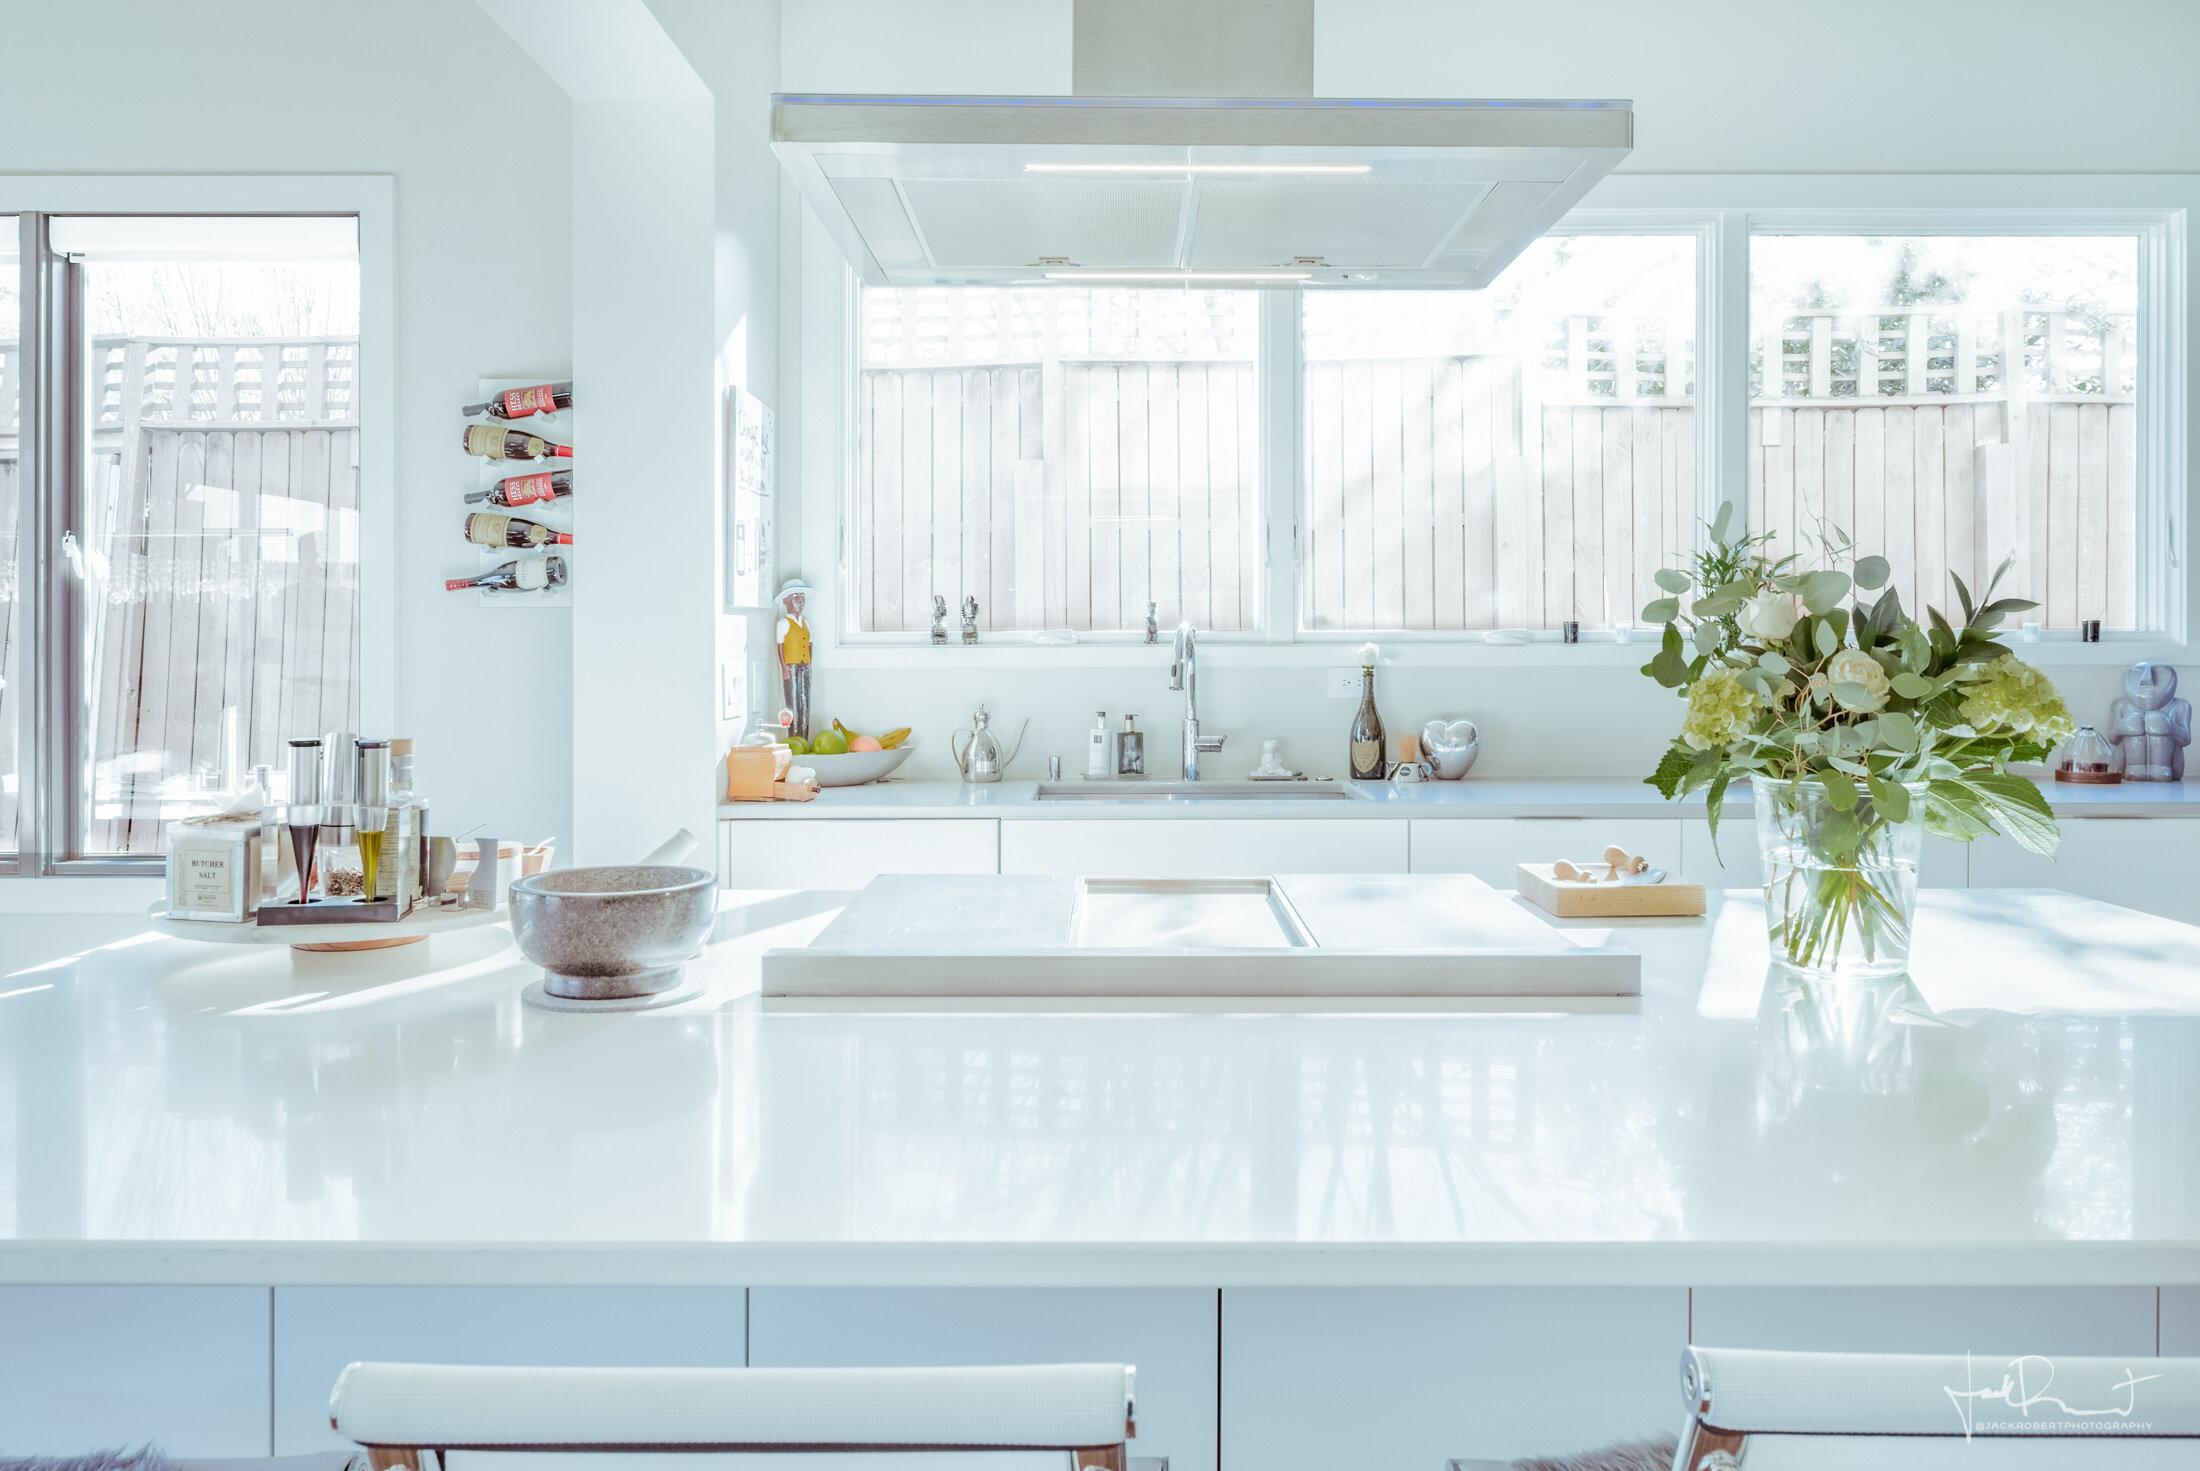 2020-02-28 Forest Kitchen Design - Jack Robert Photography (7 of 52).jpg